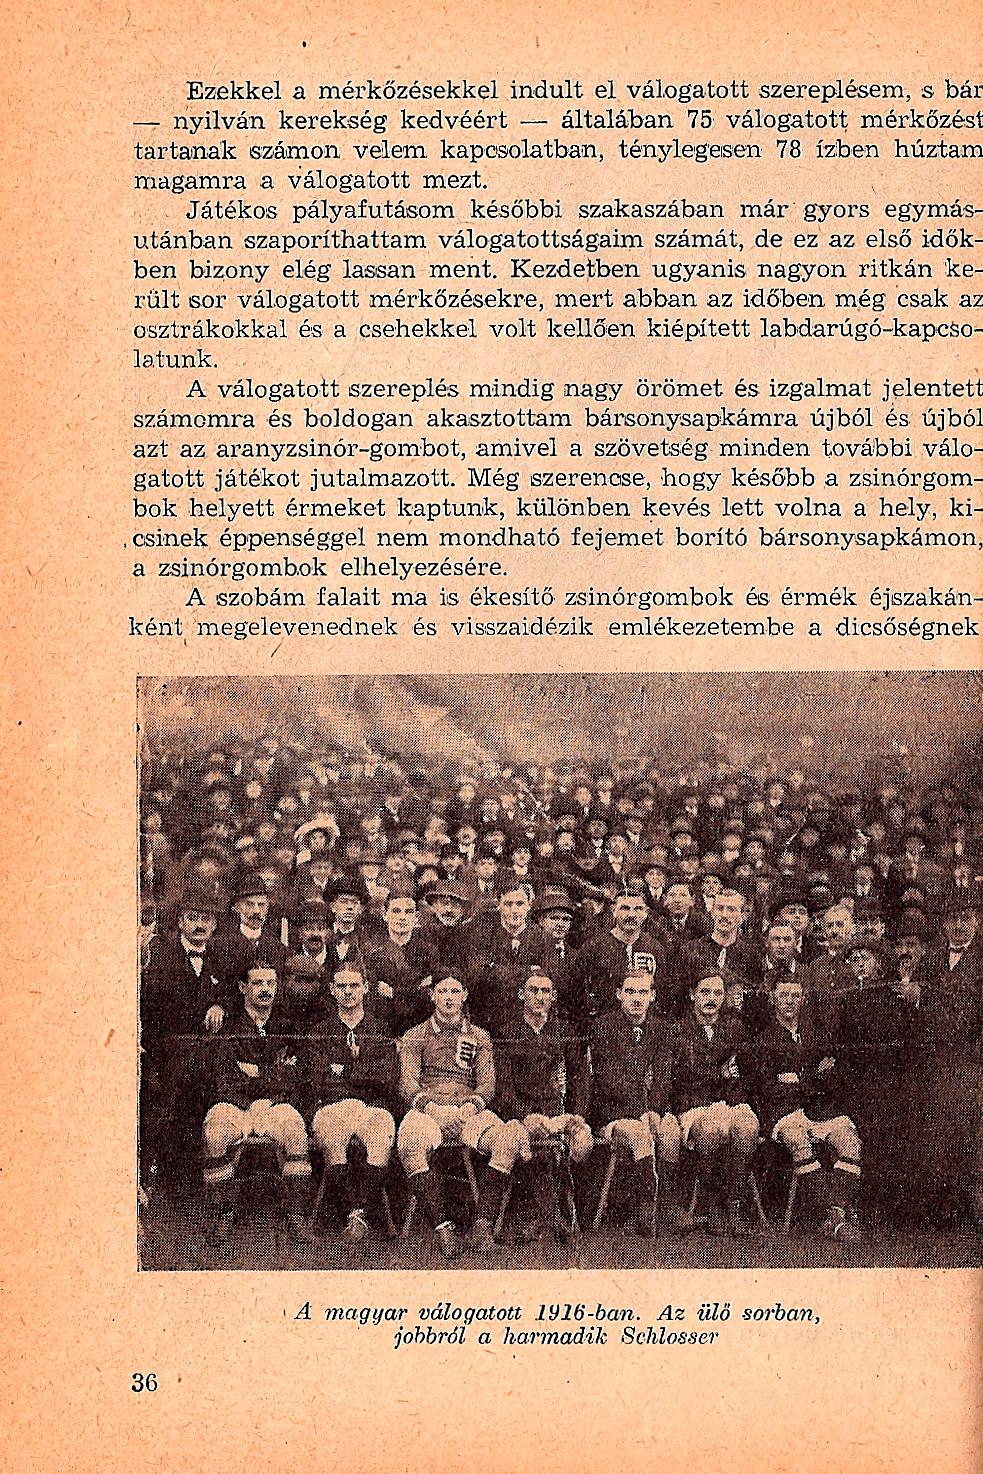 schlosser_fel-evszazad_1957_36_1102